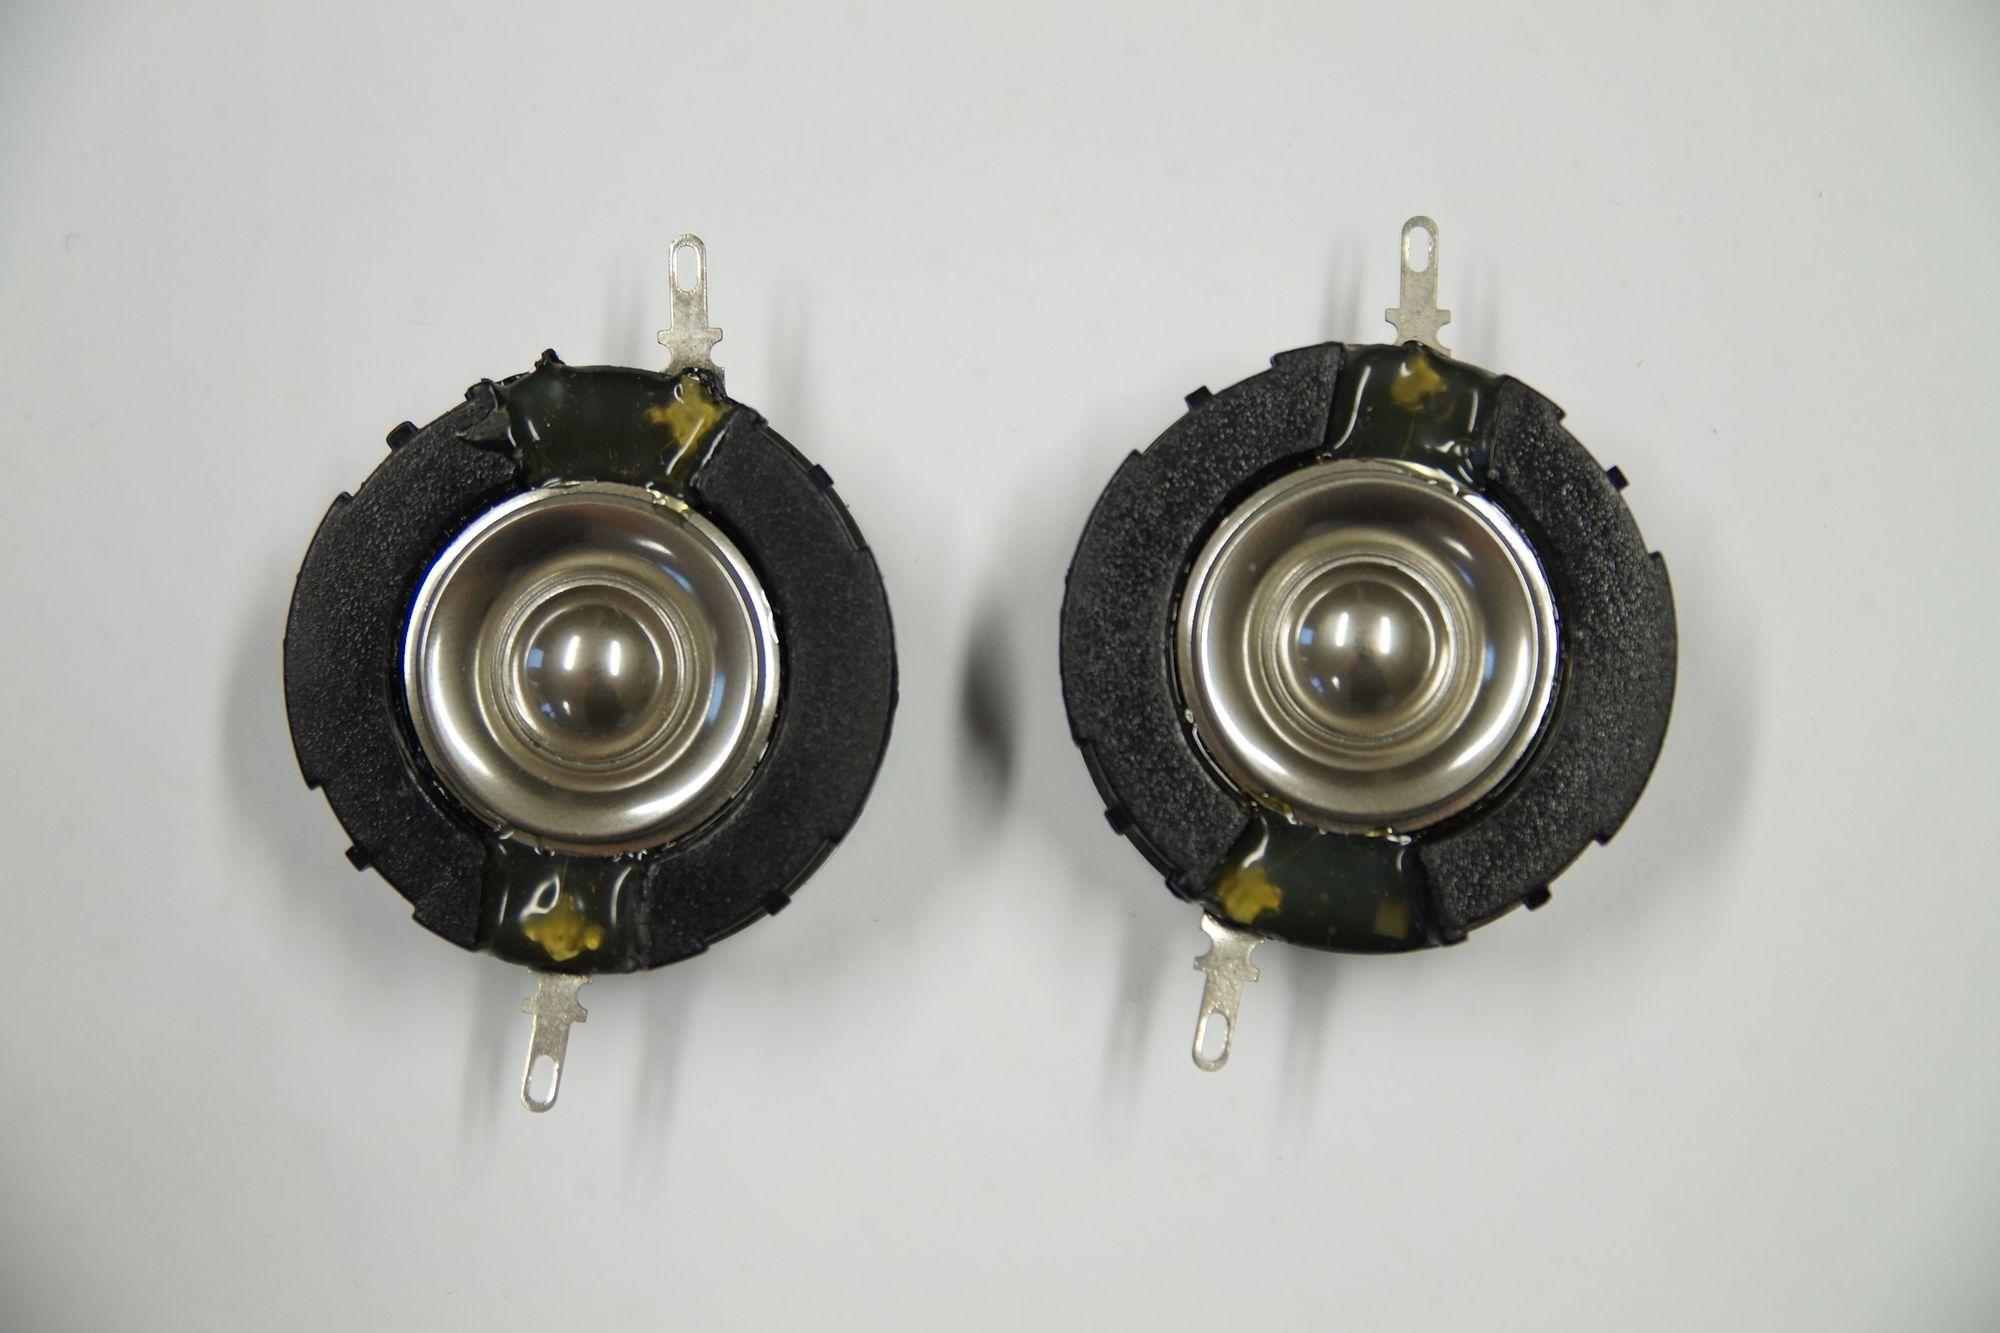 1 Paar Heco HT13XPC450, 30 Watt max., SERVICEWARE – Bild 1